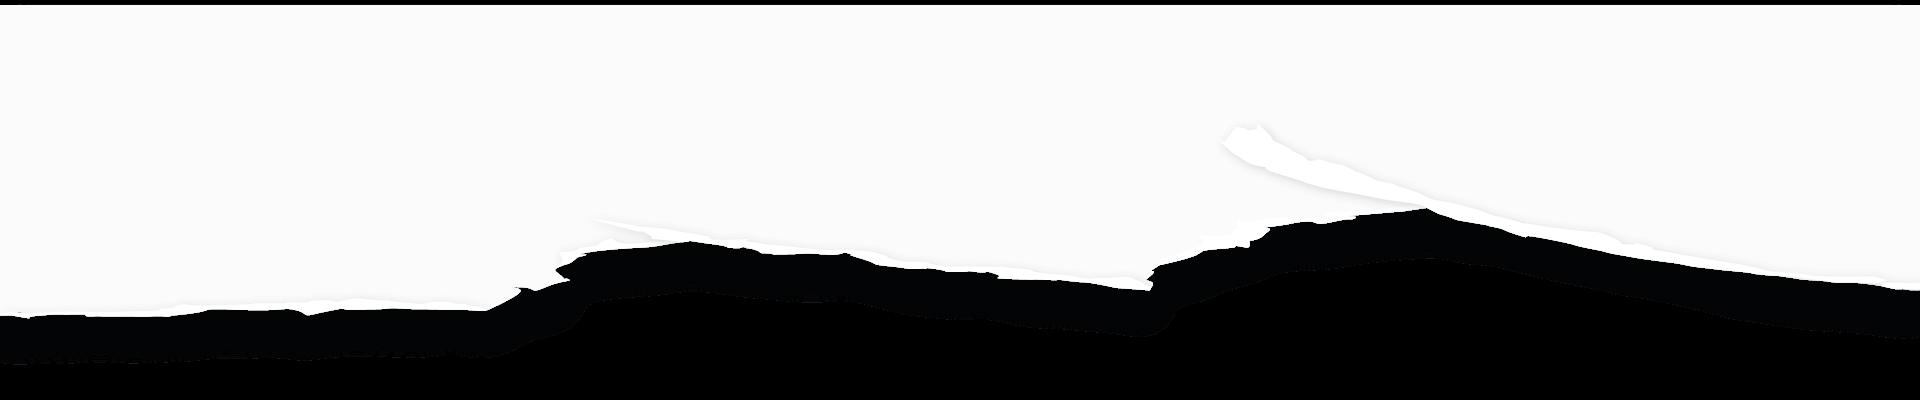 gruppenhaltung-perde-ganzjährig-koppel-ganzjährig-weidegang-gilching-münchen-starnberg-fürstenfeldbruck